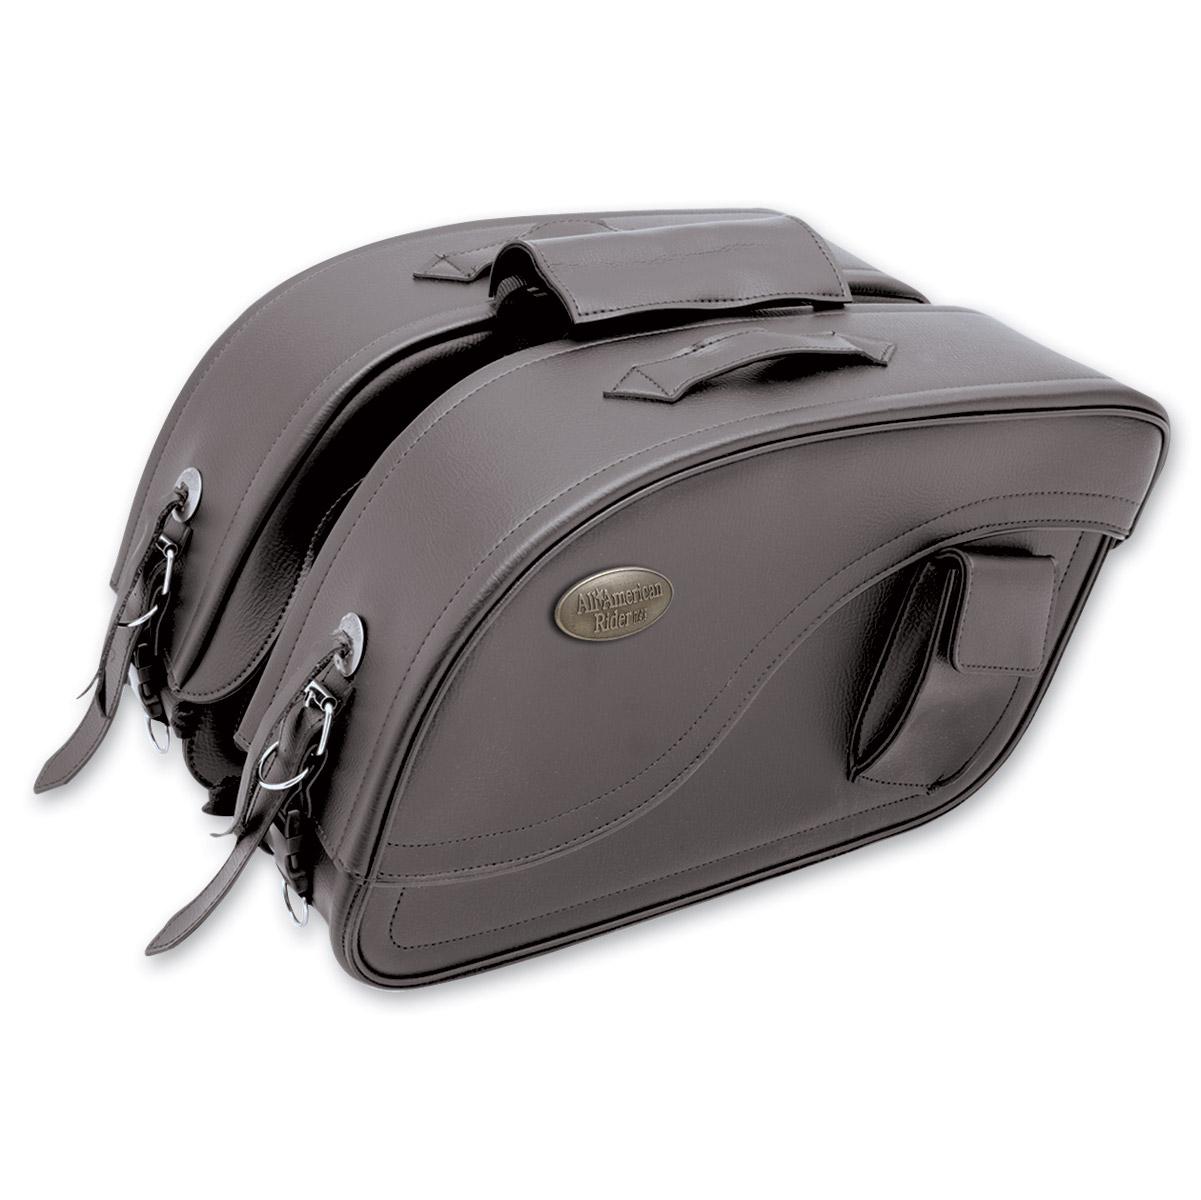 All American Rider Futura 2000 Detachable Slant Saddlebags